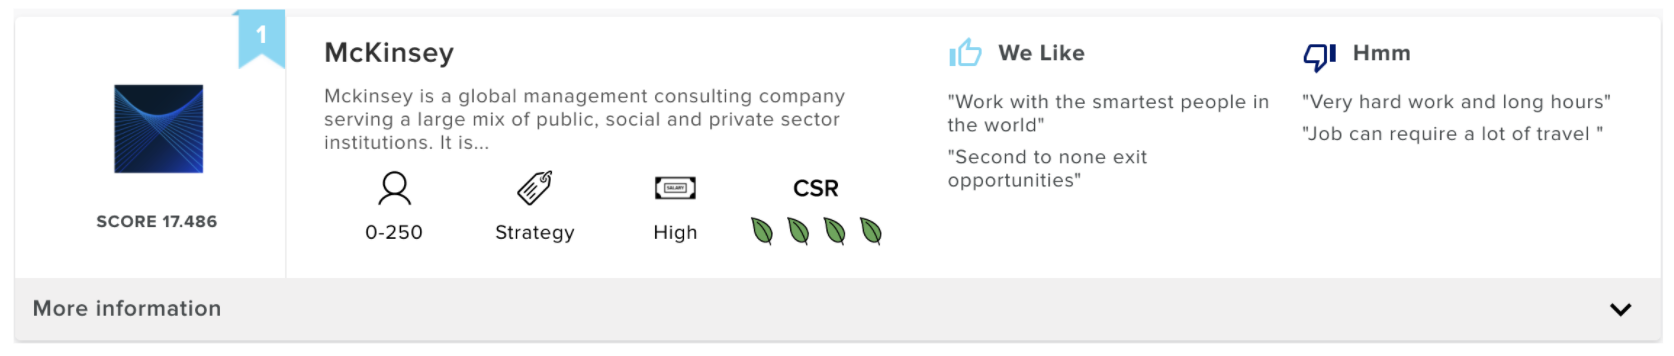 McKinsey company profile